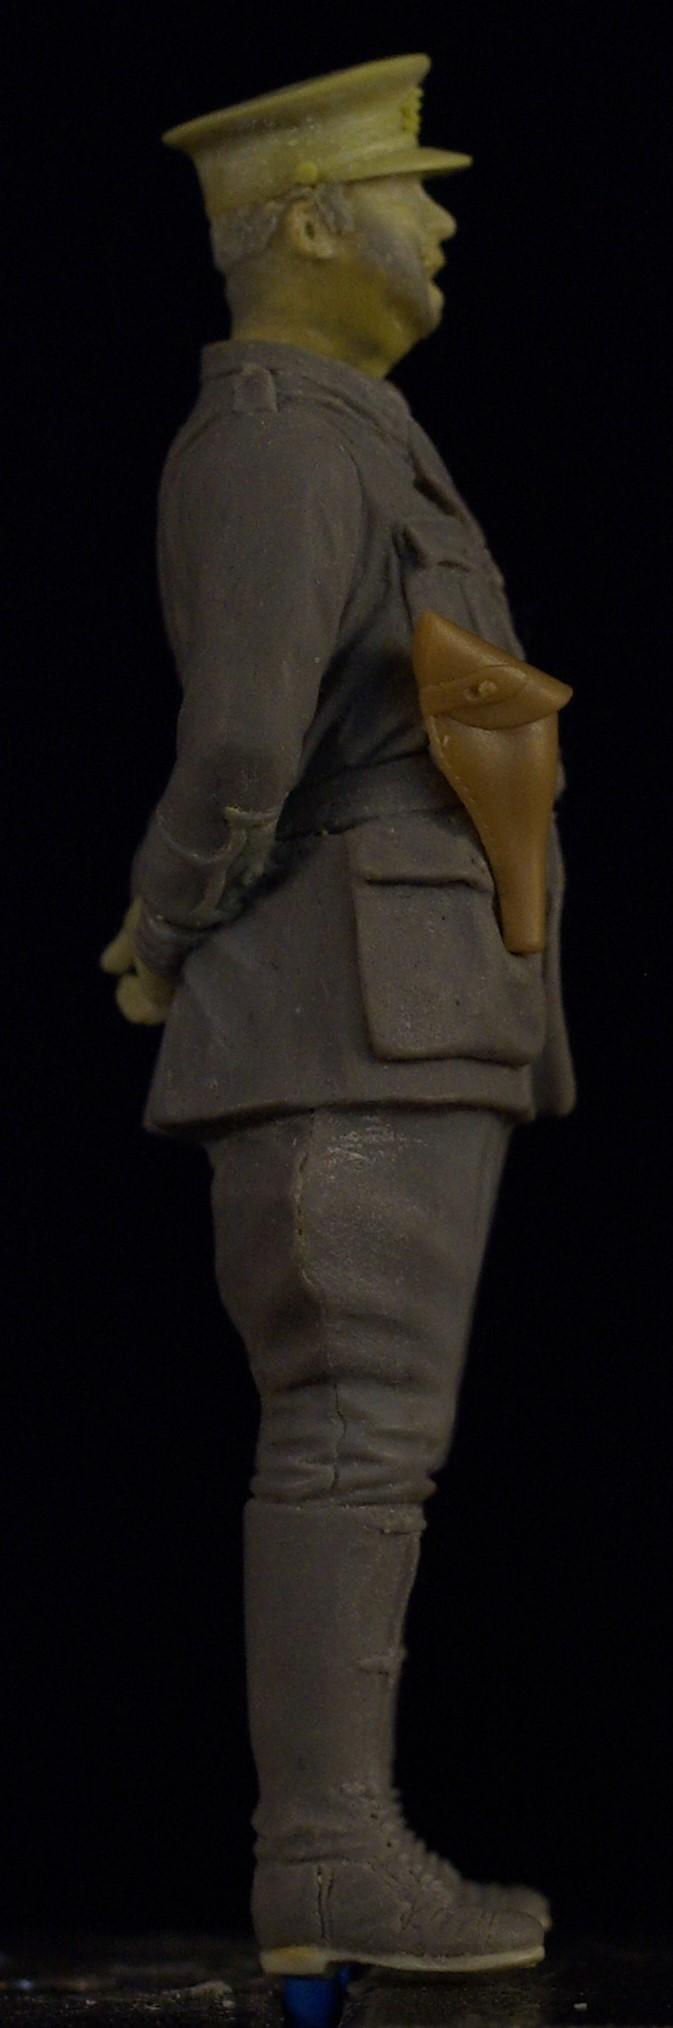 Le râleur, british officer WW1 - Page 2 _igp9116